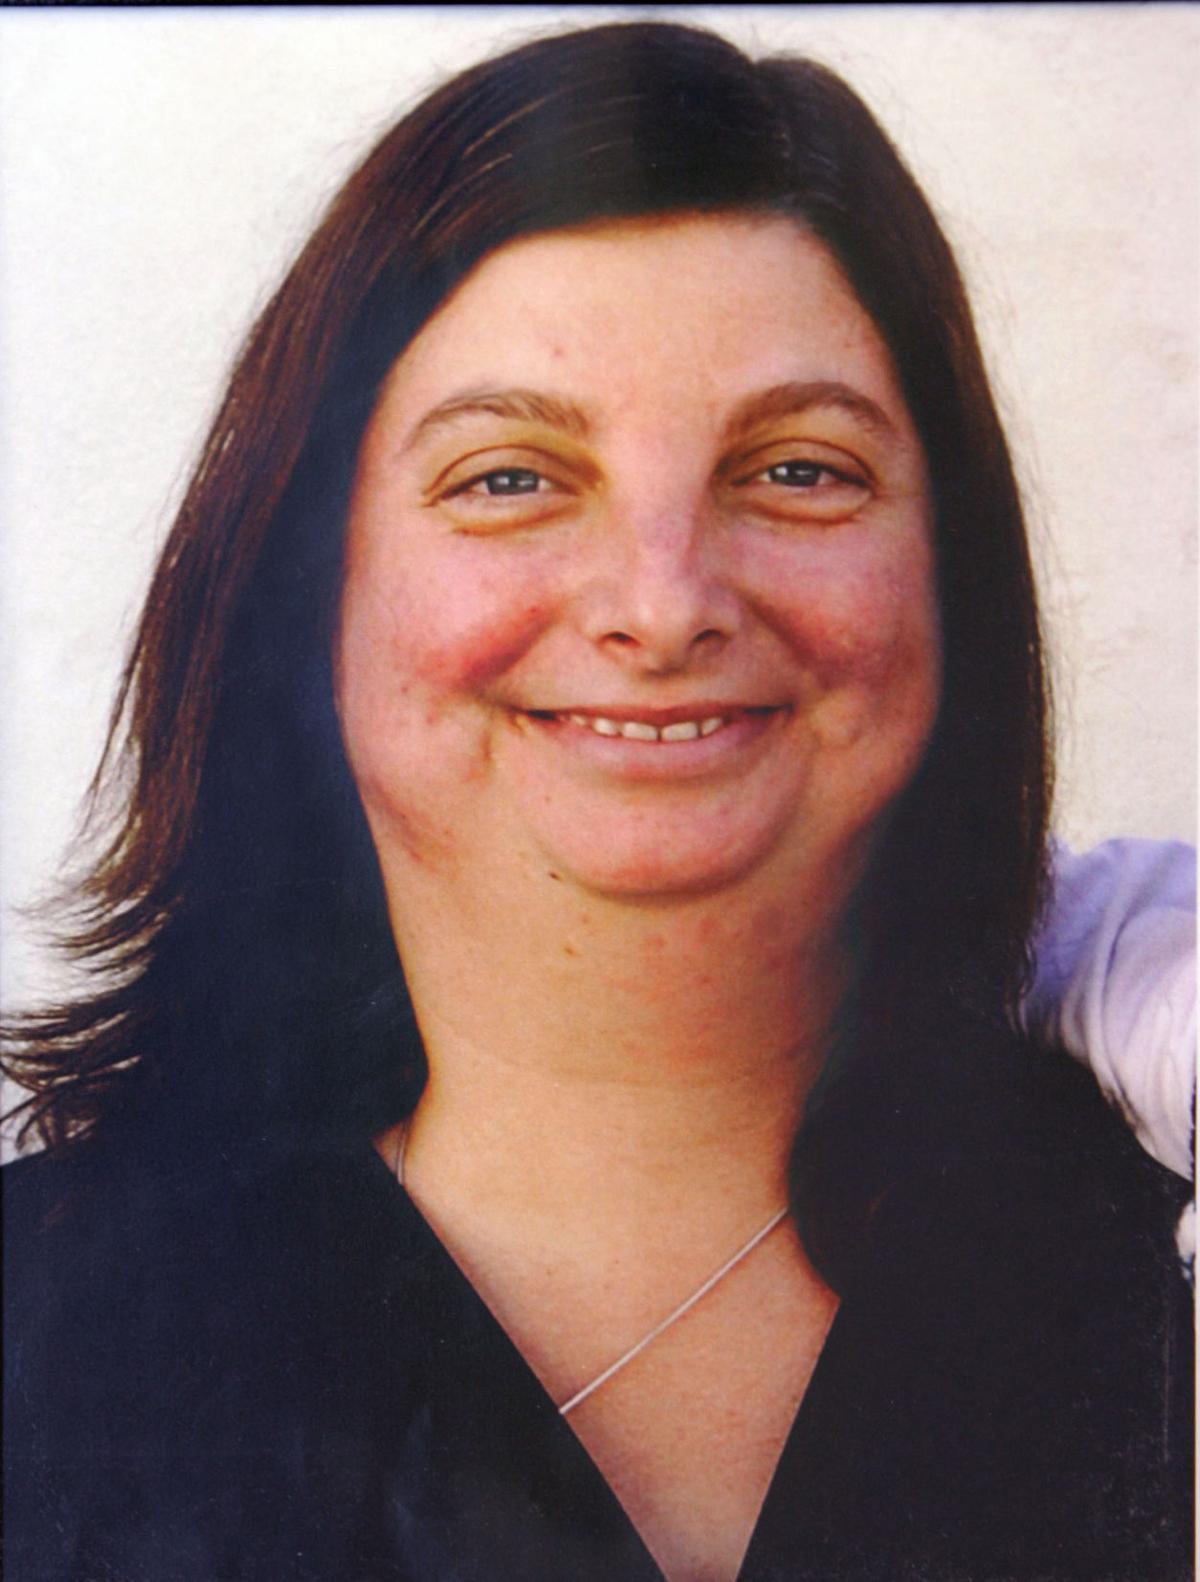 Investigators seek leads in Gayle McCaffrey disappearance